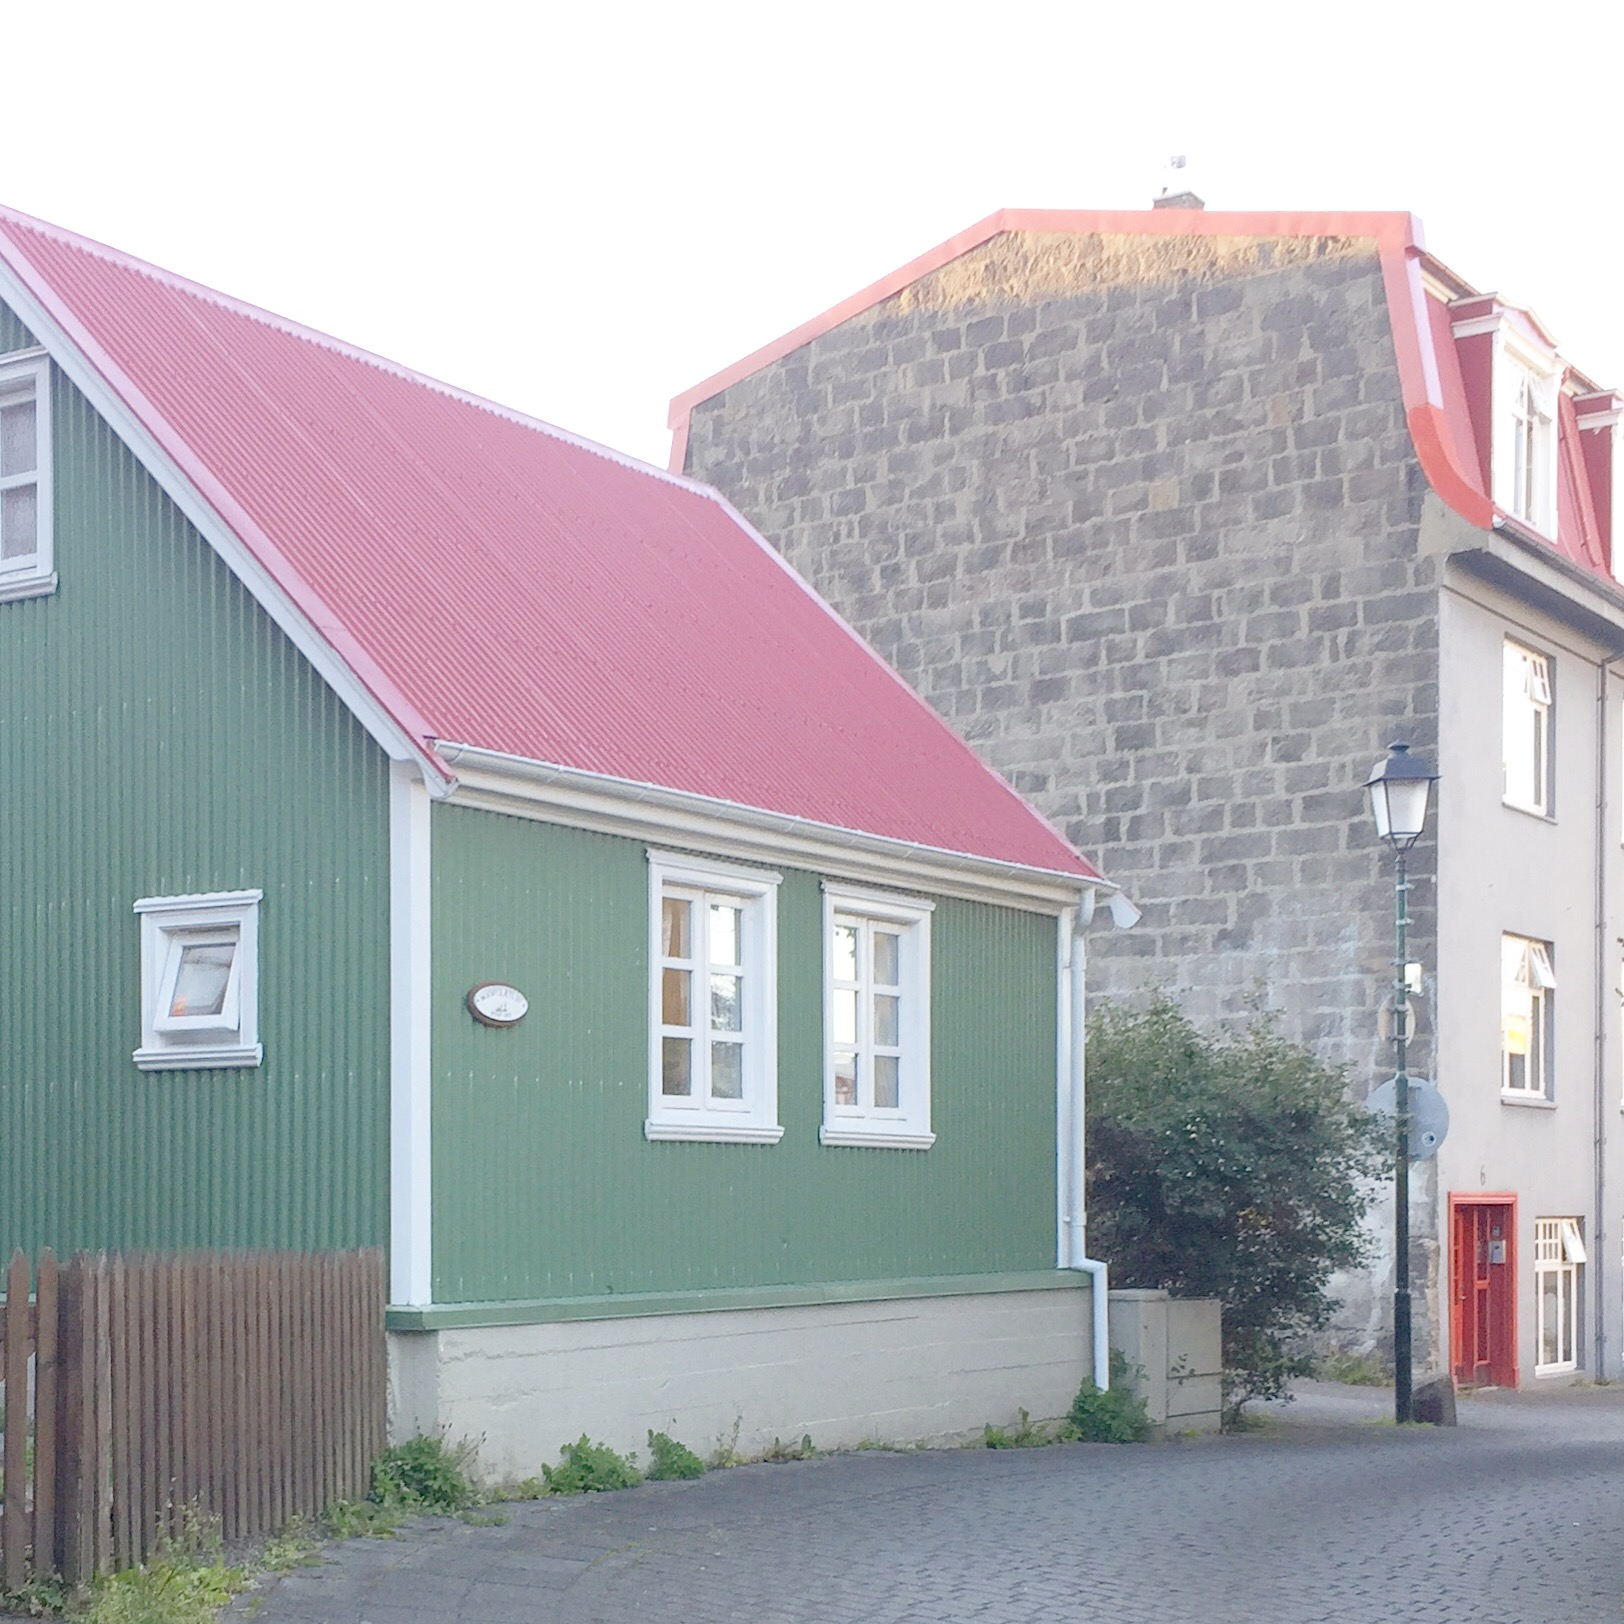 ColourInspirationHouseReykjavik.JPG